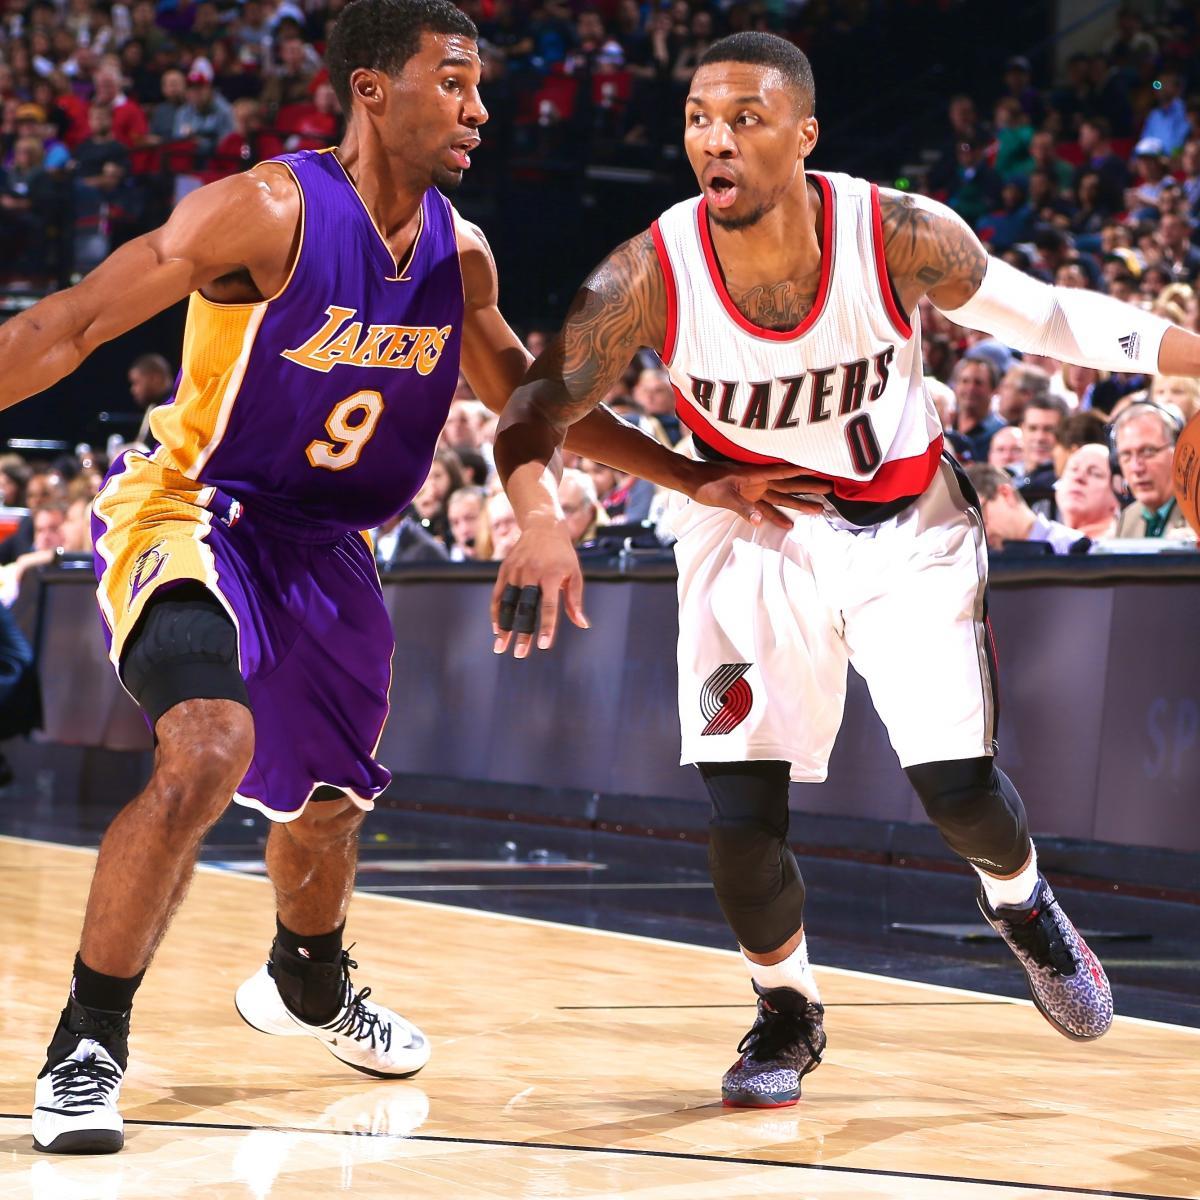 Portland Blazers Live Score: Los Angeles Lakers Vs. Portland Trail Blazers: Live Score